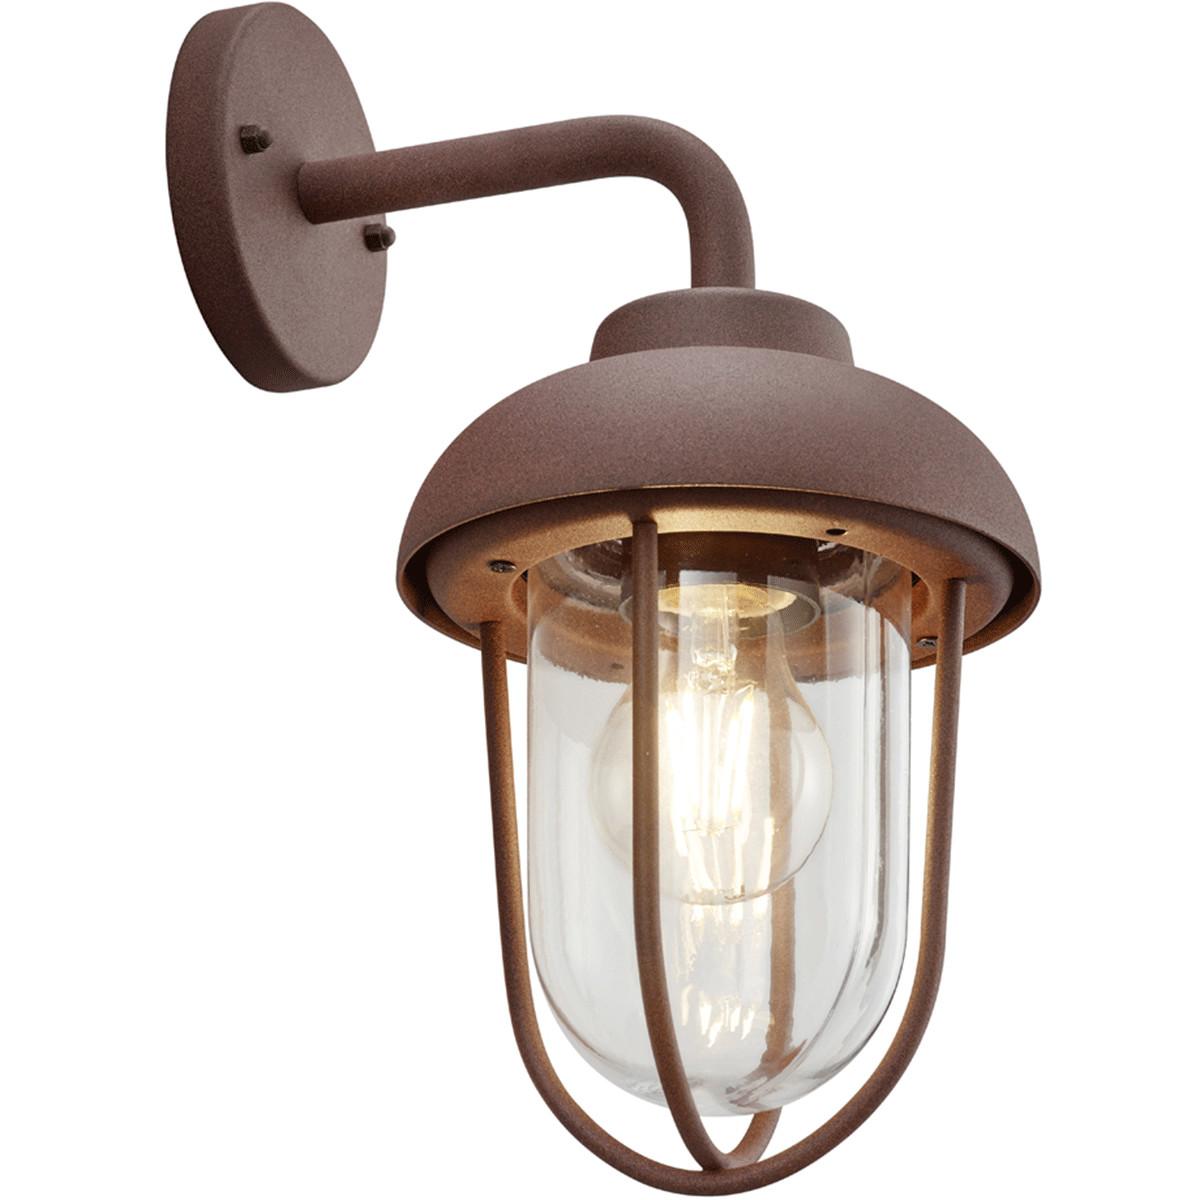 LED Tuinverlichting - Tuinlamp - Trion Dereuri - Wand - E27 Fitting - Roestkleur - Aluminium